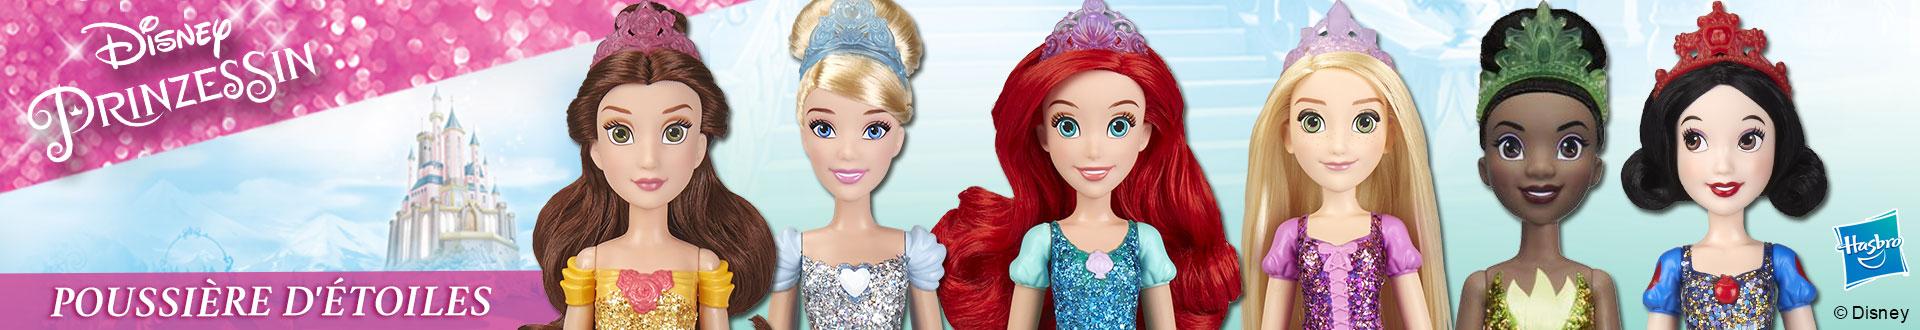 PGP New Disney Princess Promo